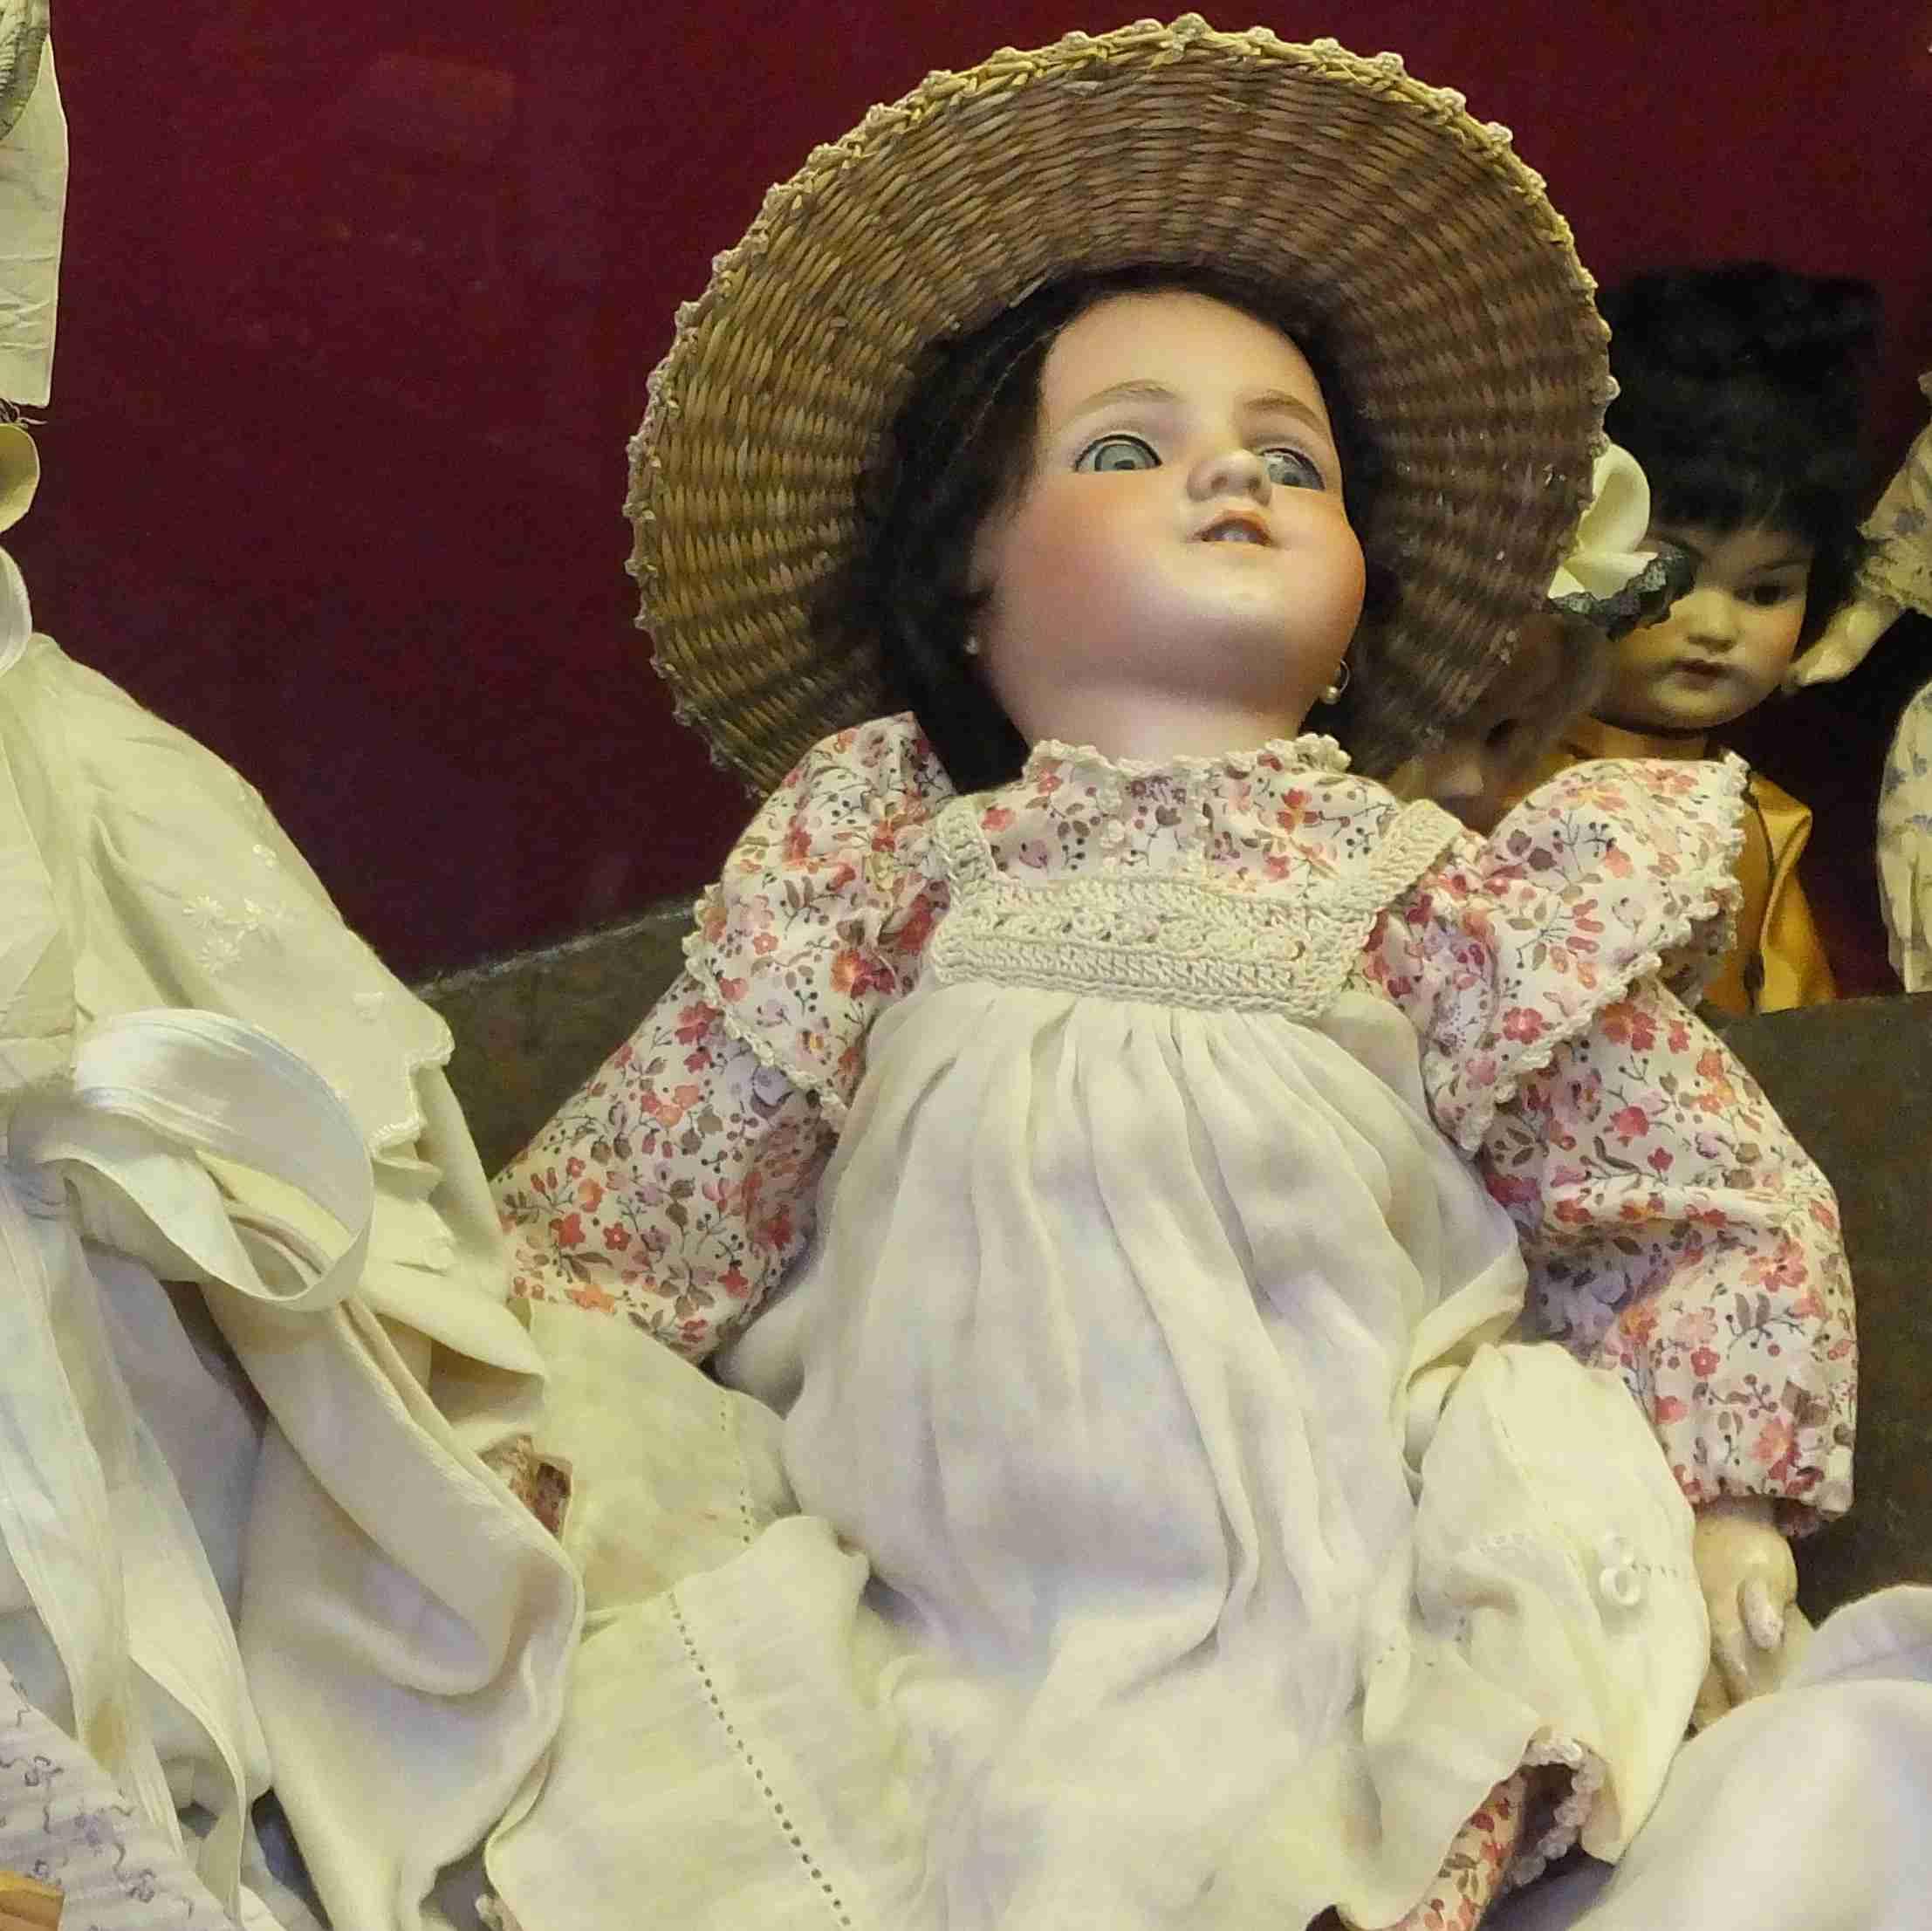 Simon & Halbig dolls